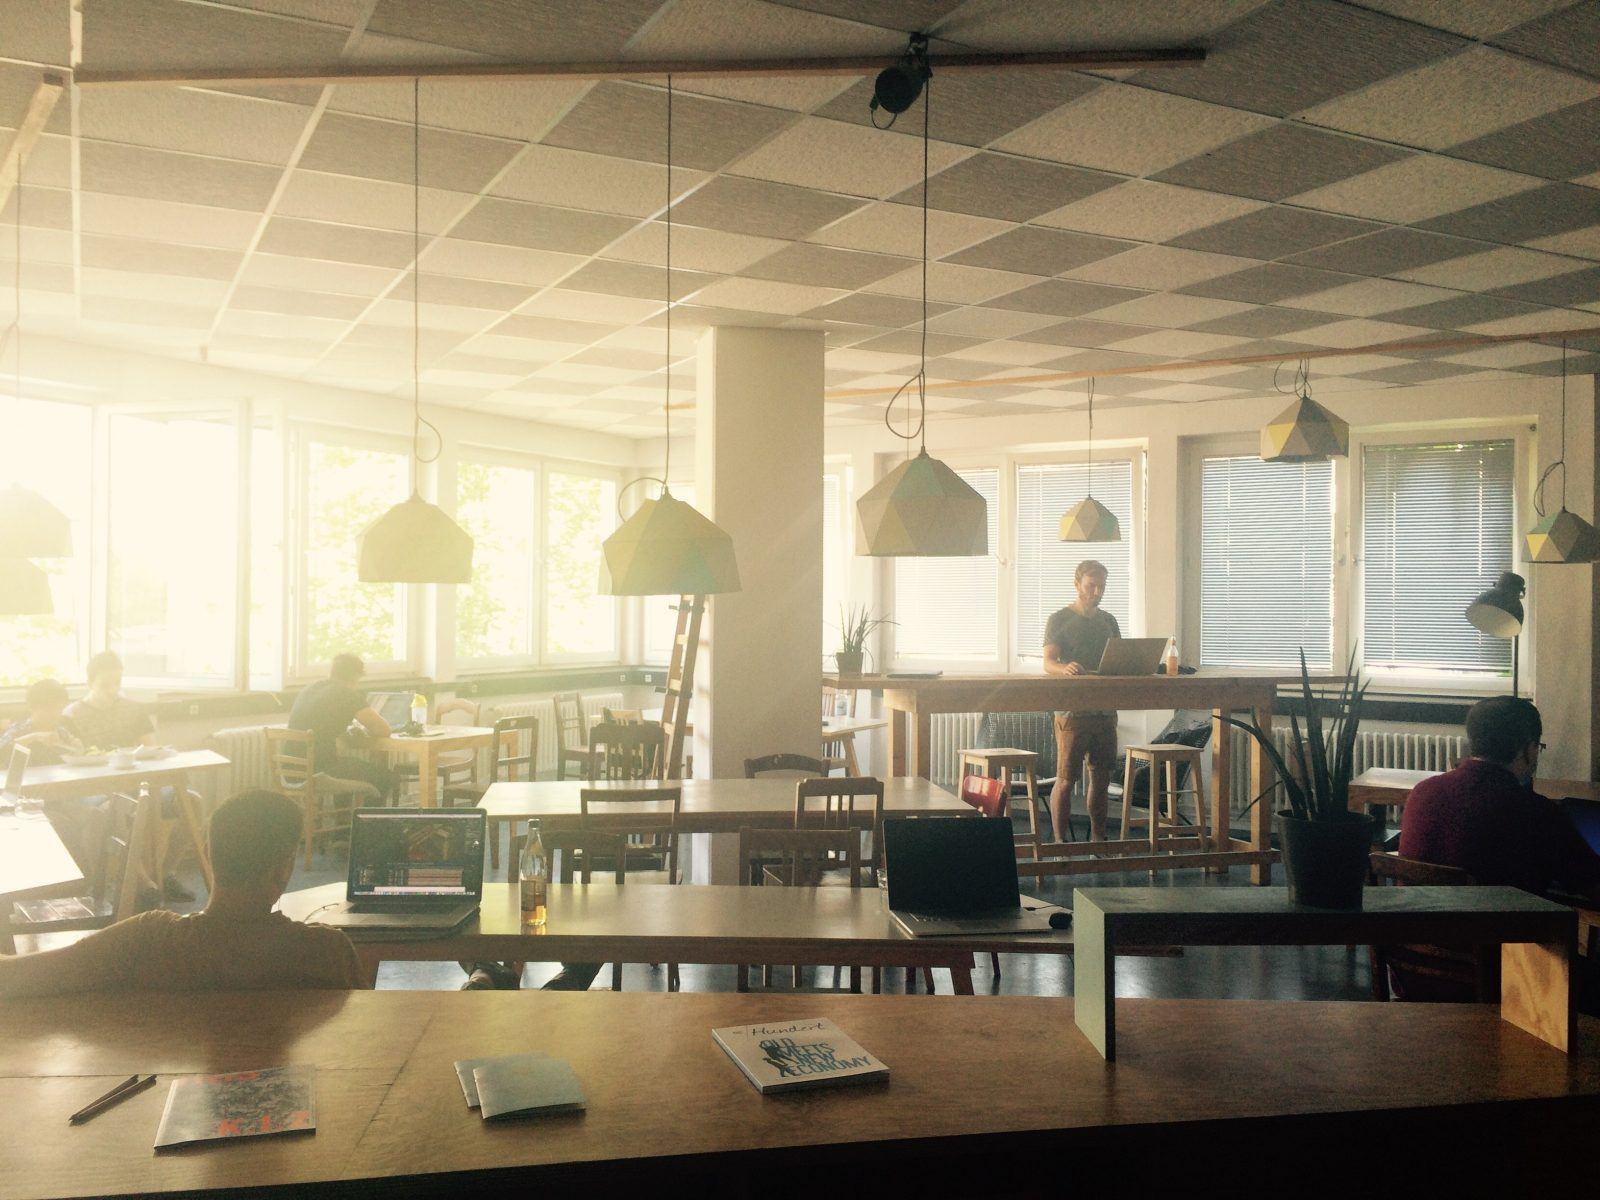 Arbeitsatmosphäre im Betahaus